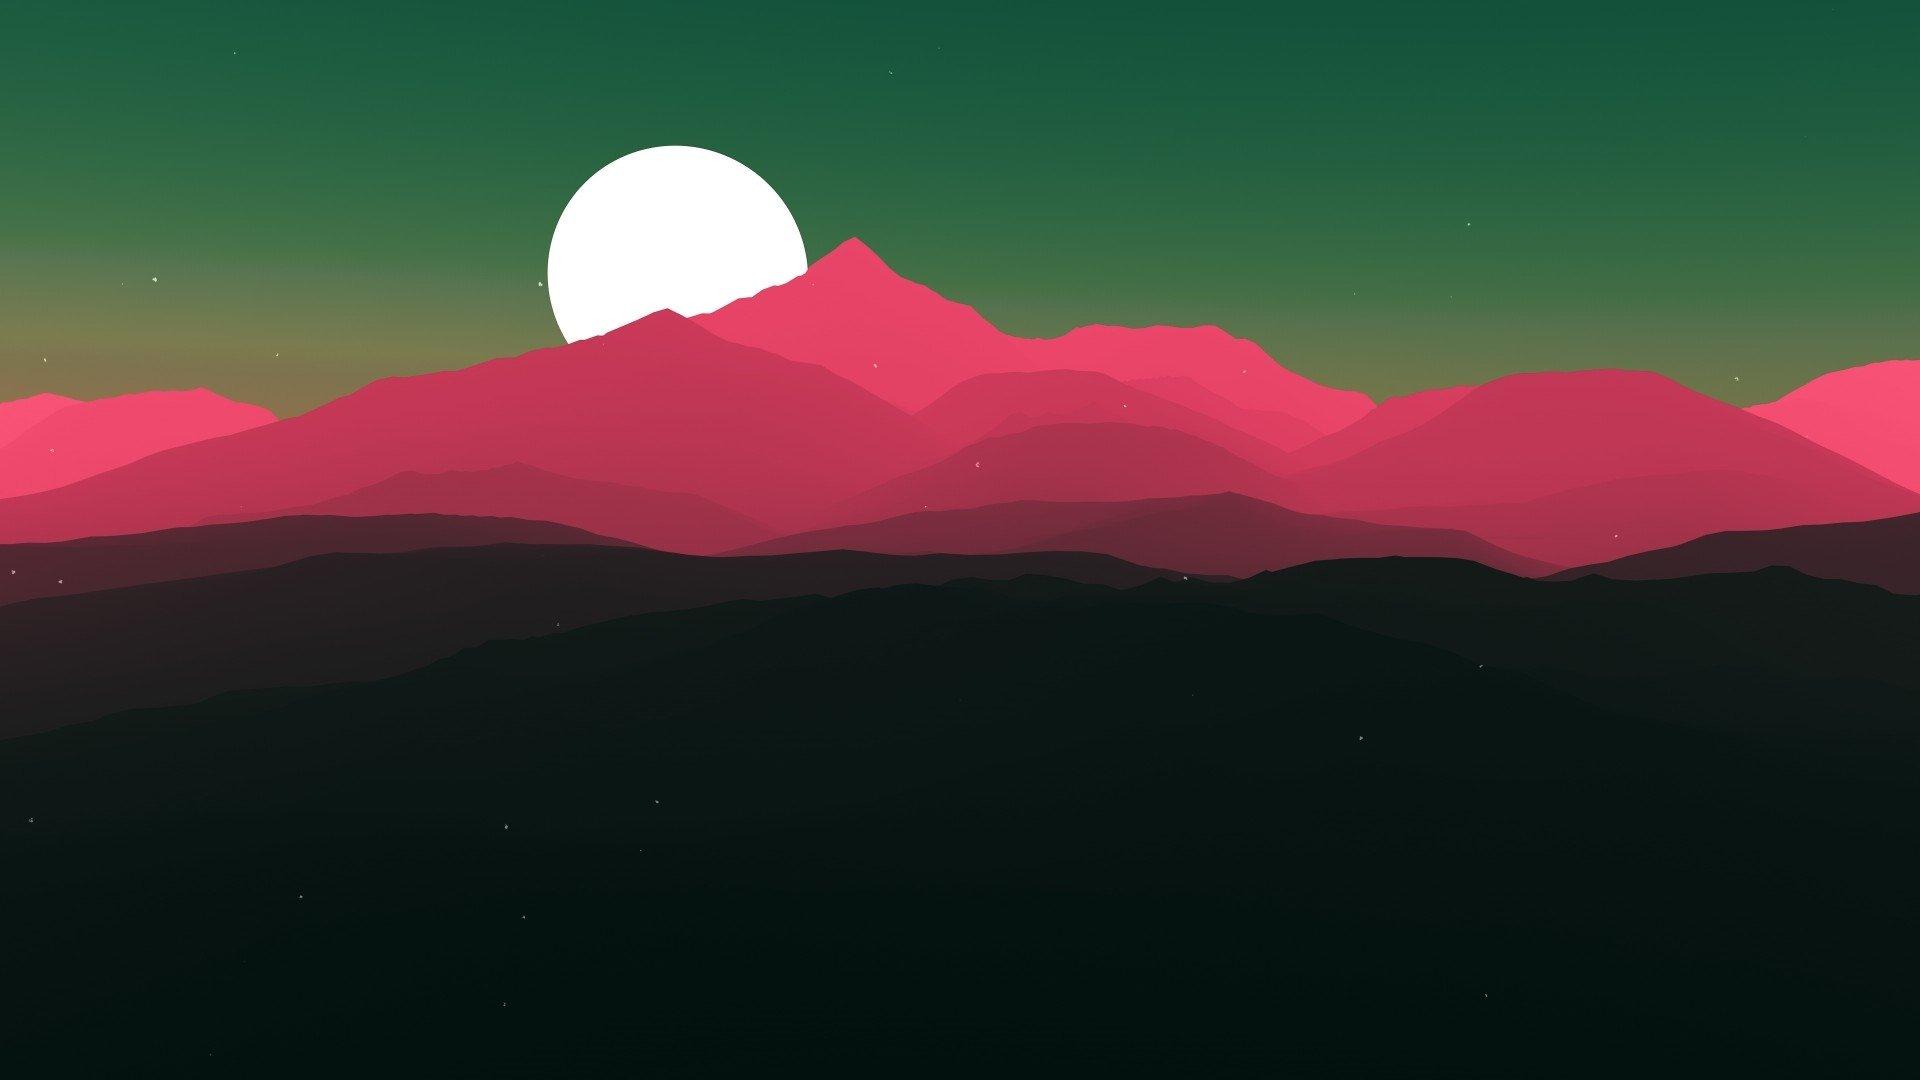 Aesthetic Moon Wallpaper Desktop